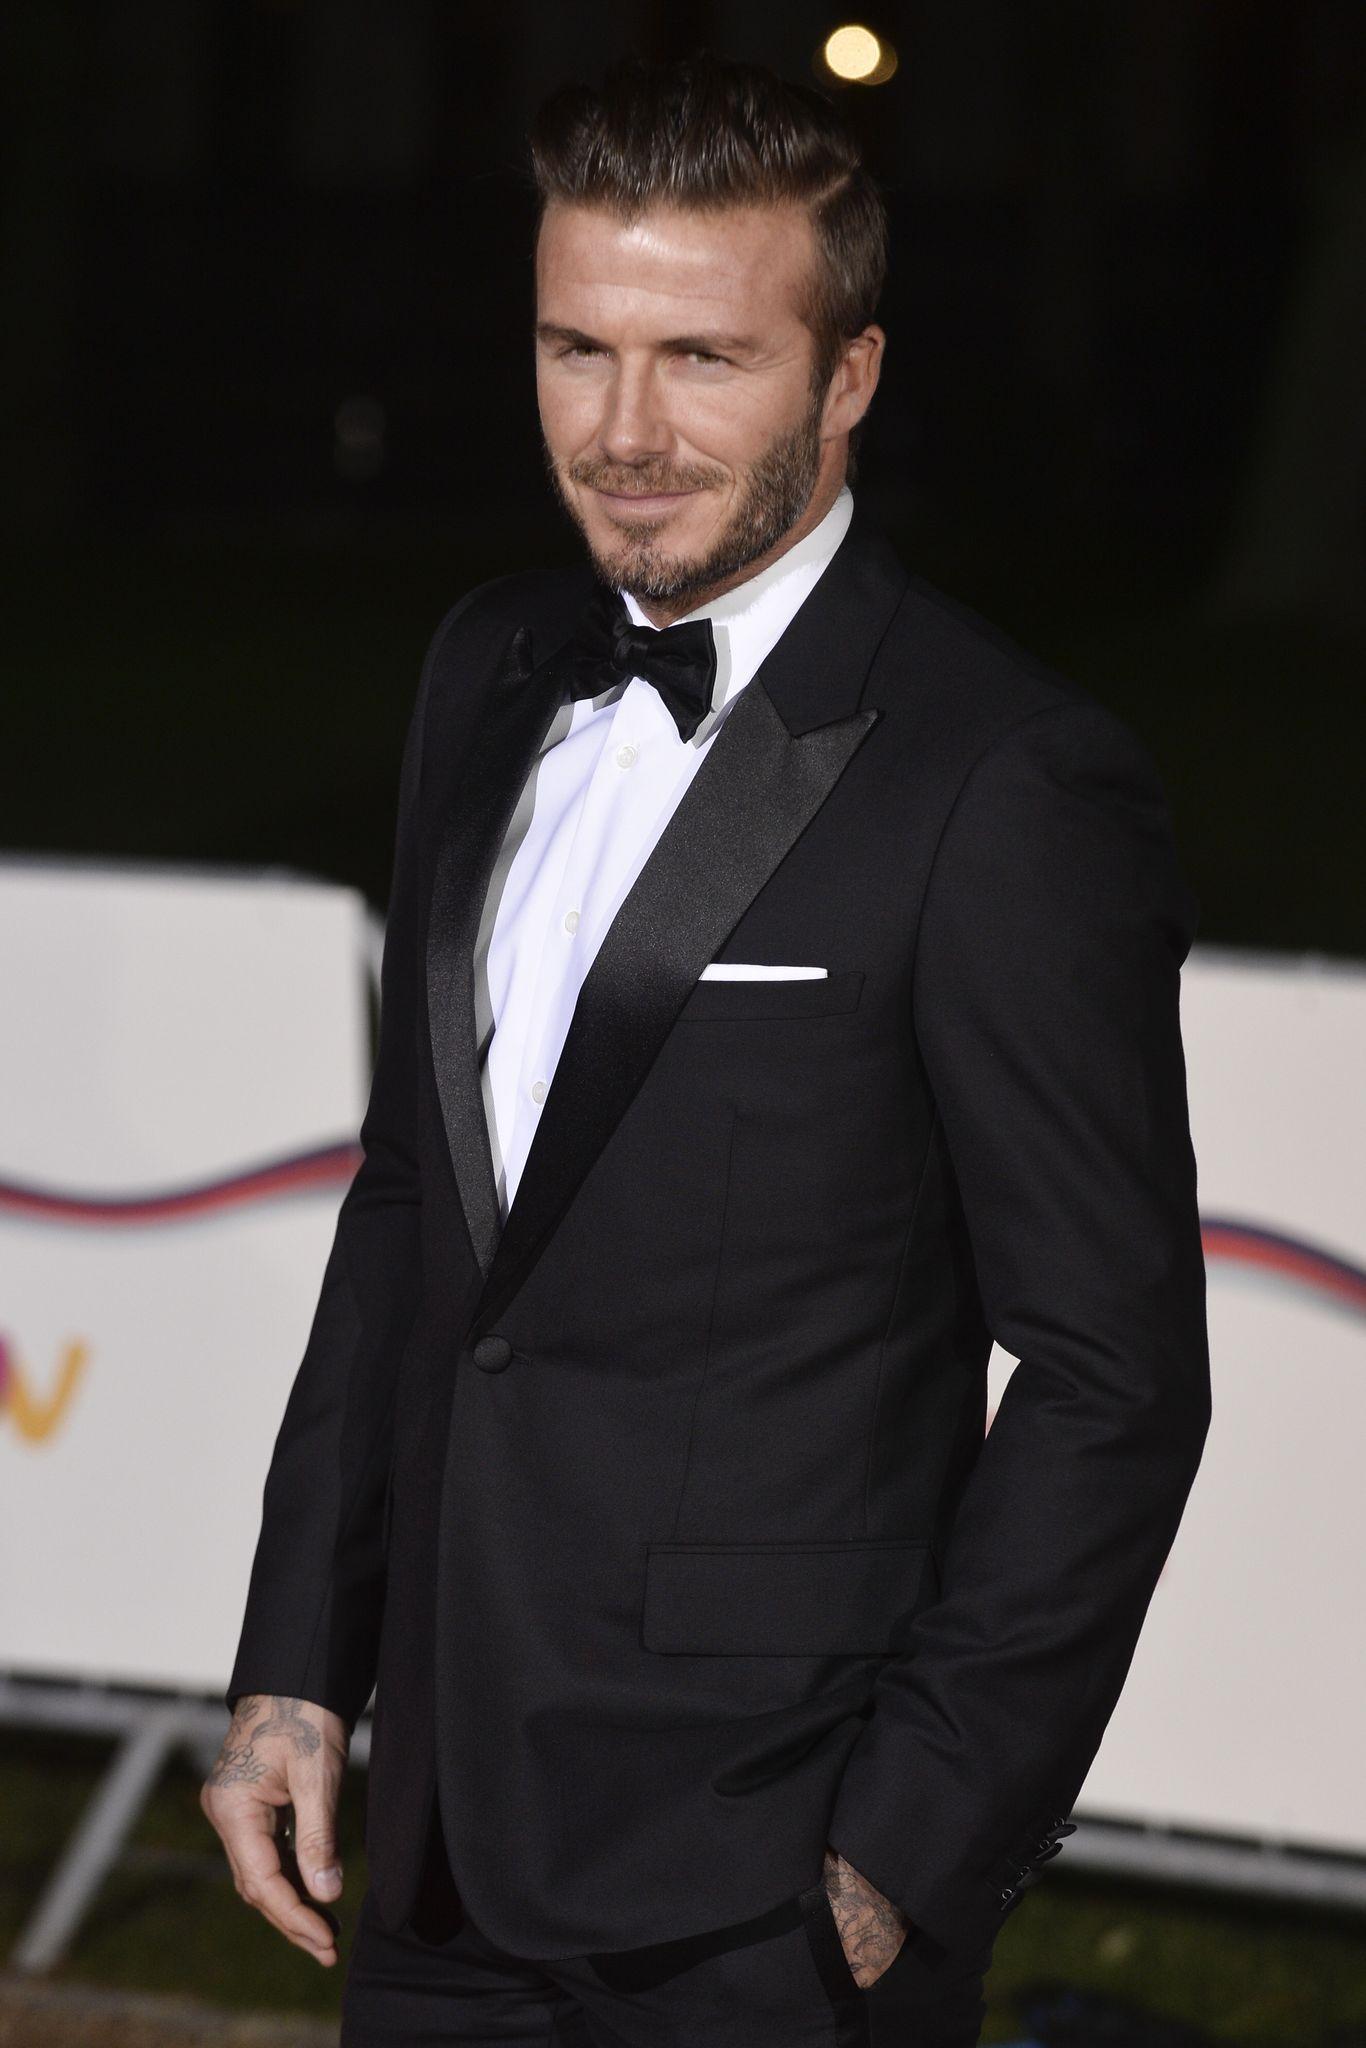 Genug David Beckham será el próximo Agente 007? - Mendoza Post NA06